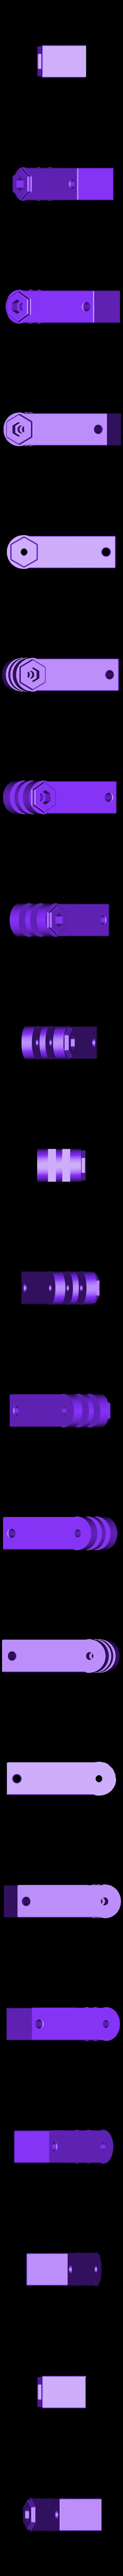 cam mount2 (1pcs).STL Download STL file Folding Quadcopter 450 Frame • 3D print object, AleksandrDolzhenko